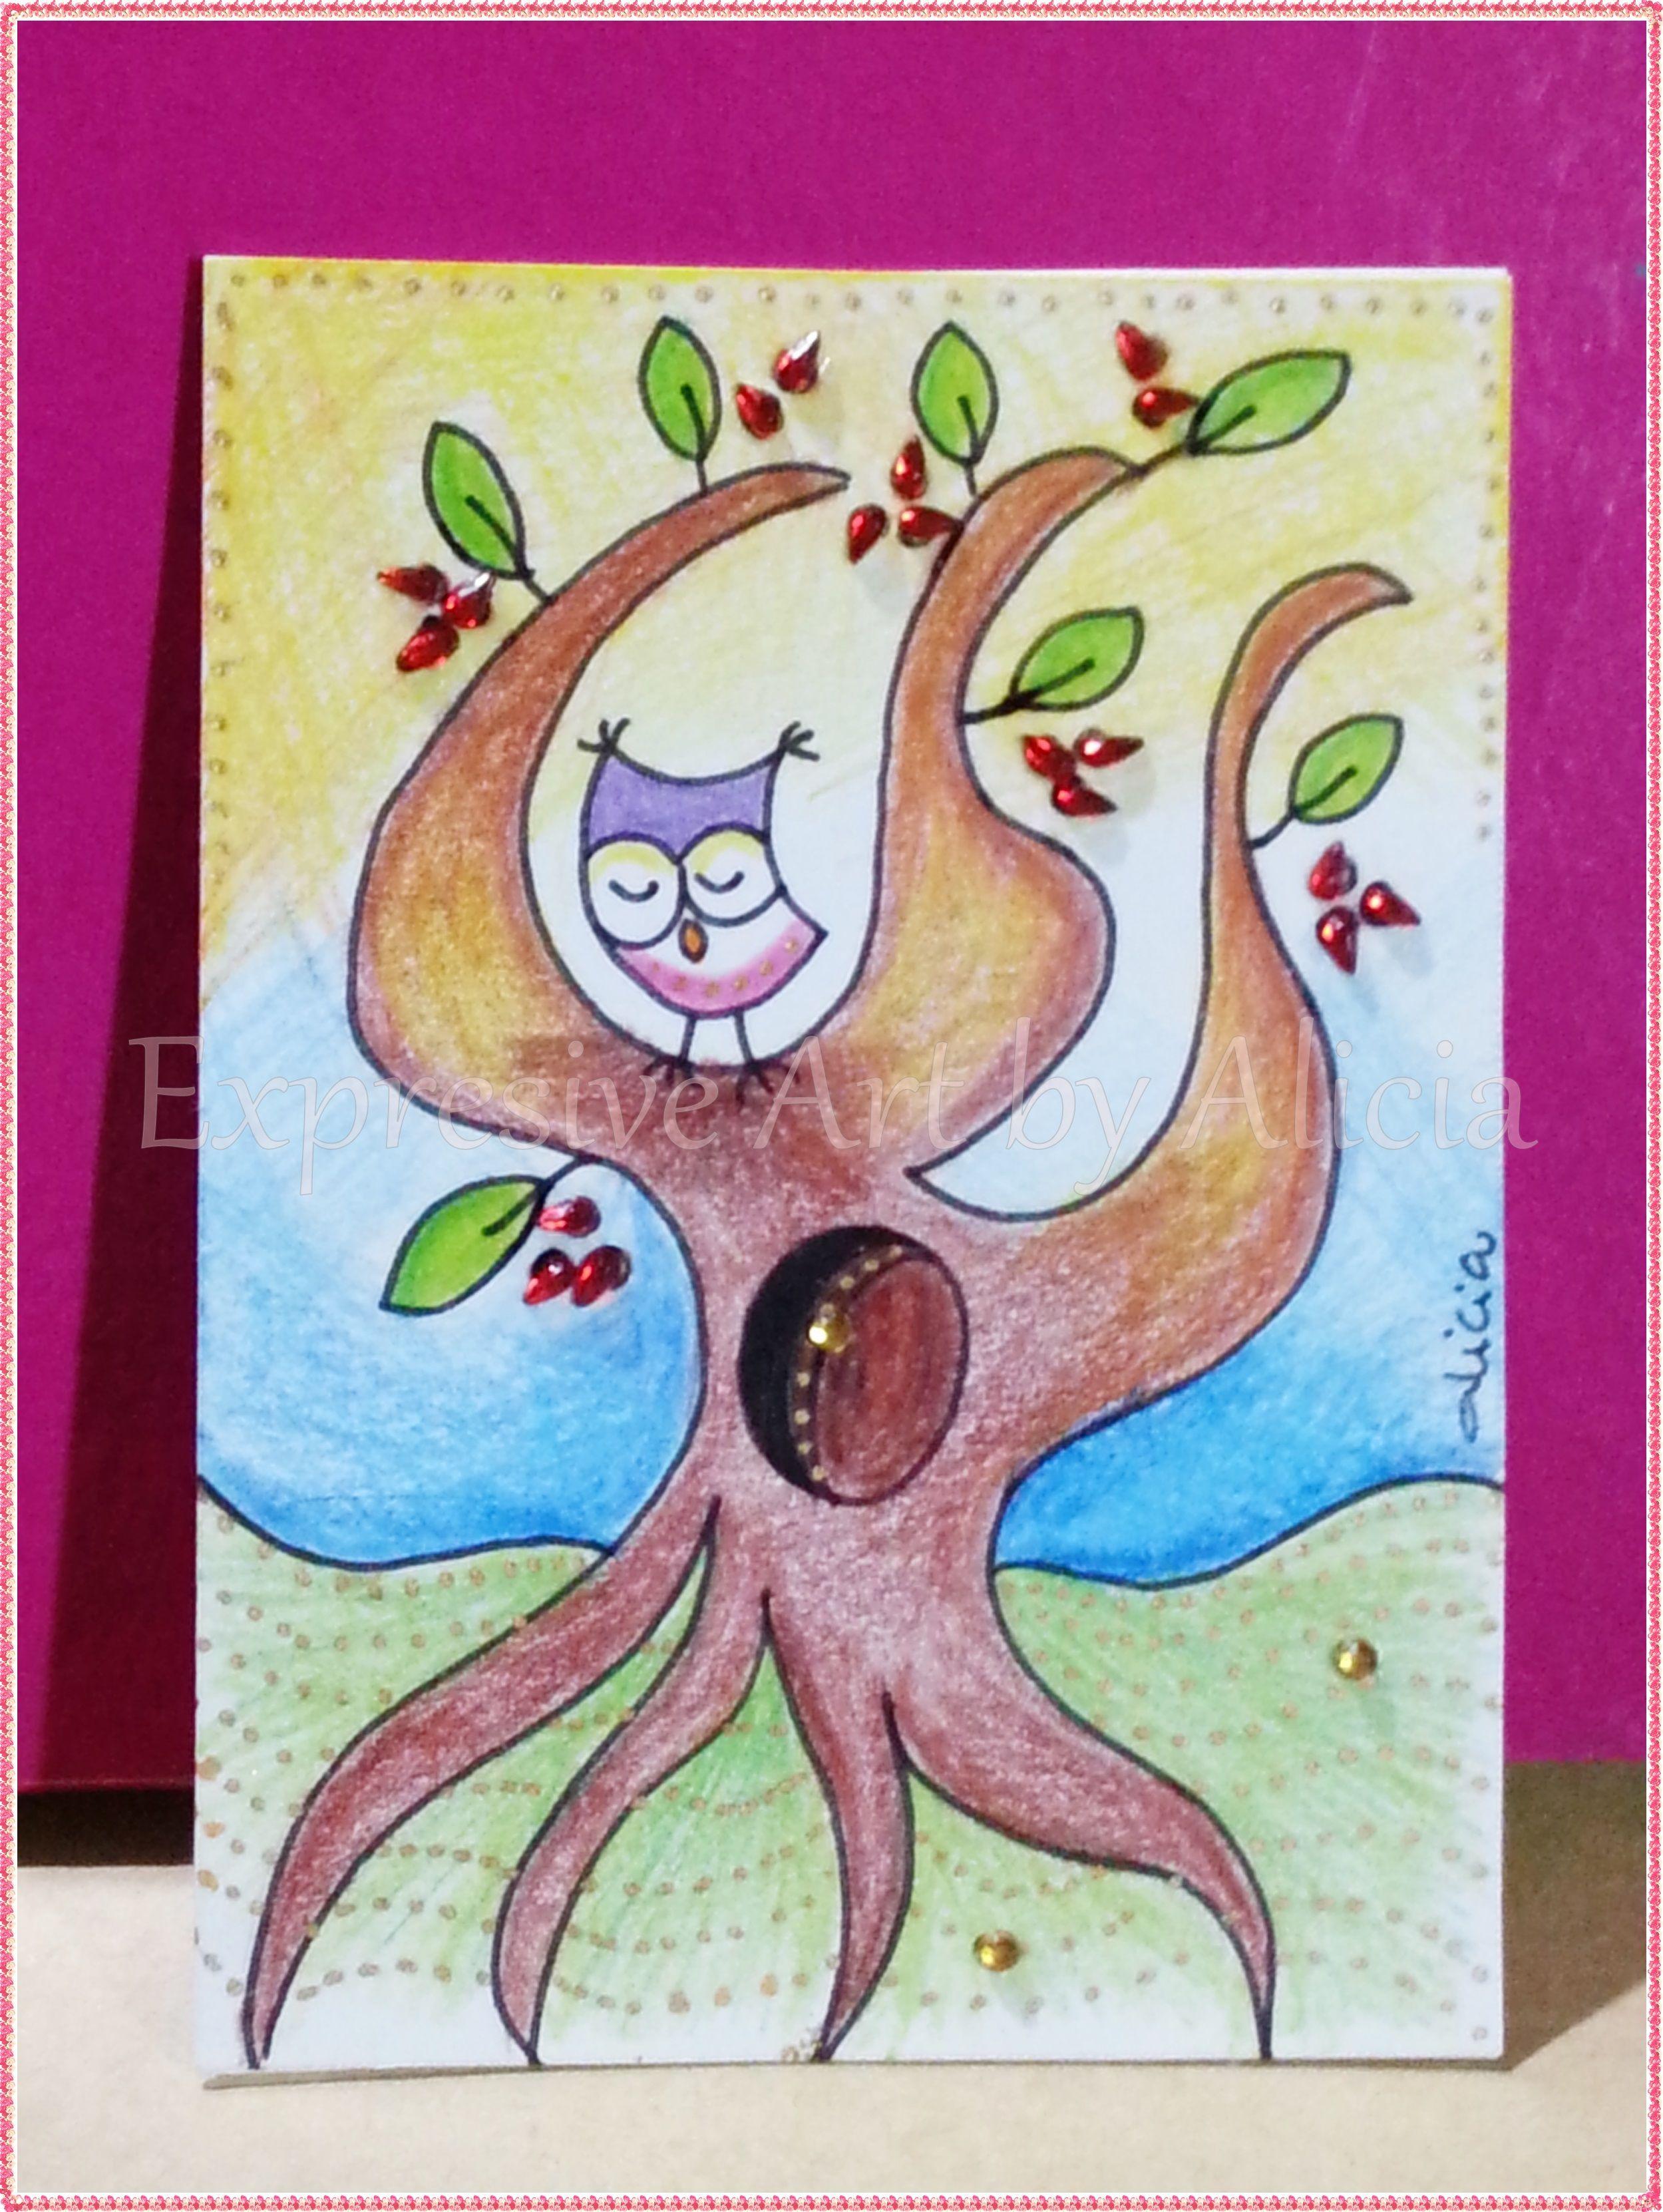 TRADED Serie: Owlies No. 02/2015 Técnica: Lápices de Color y Rotulador